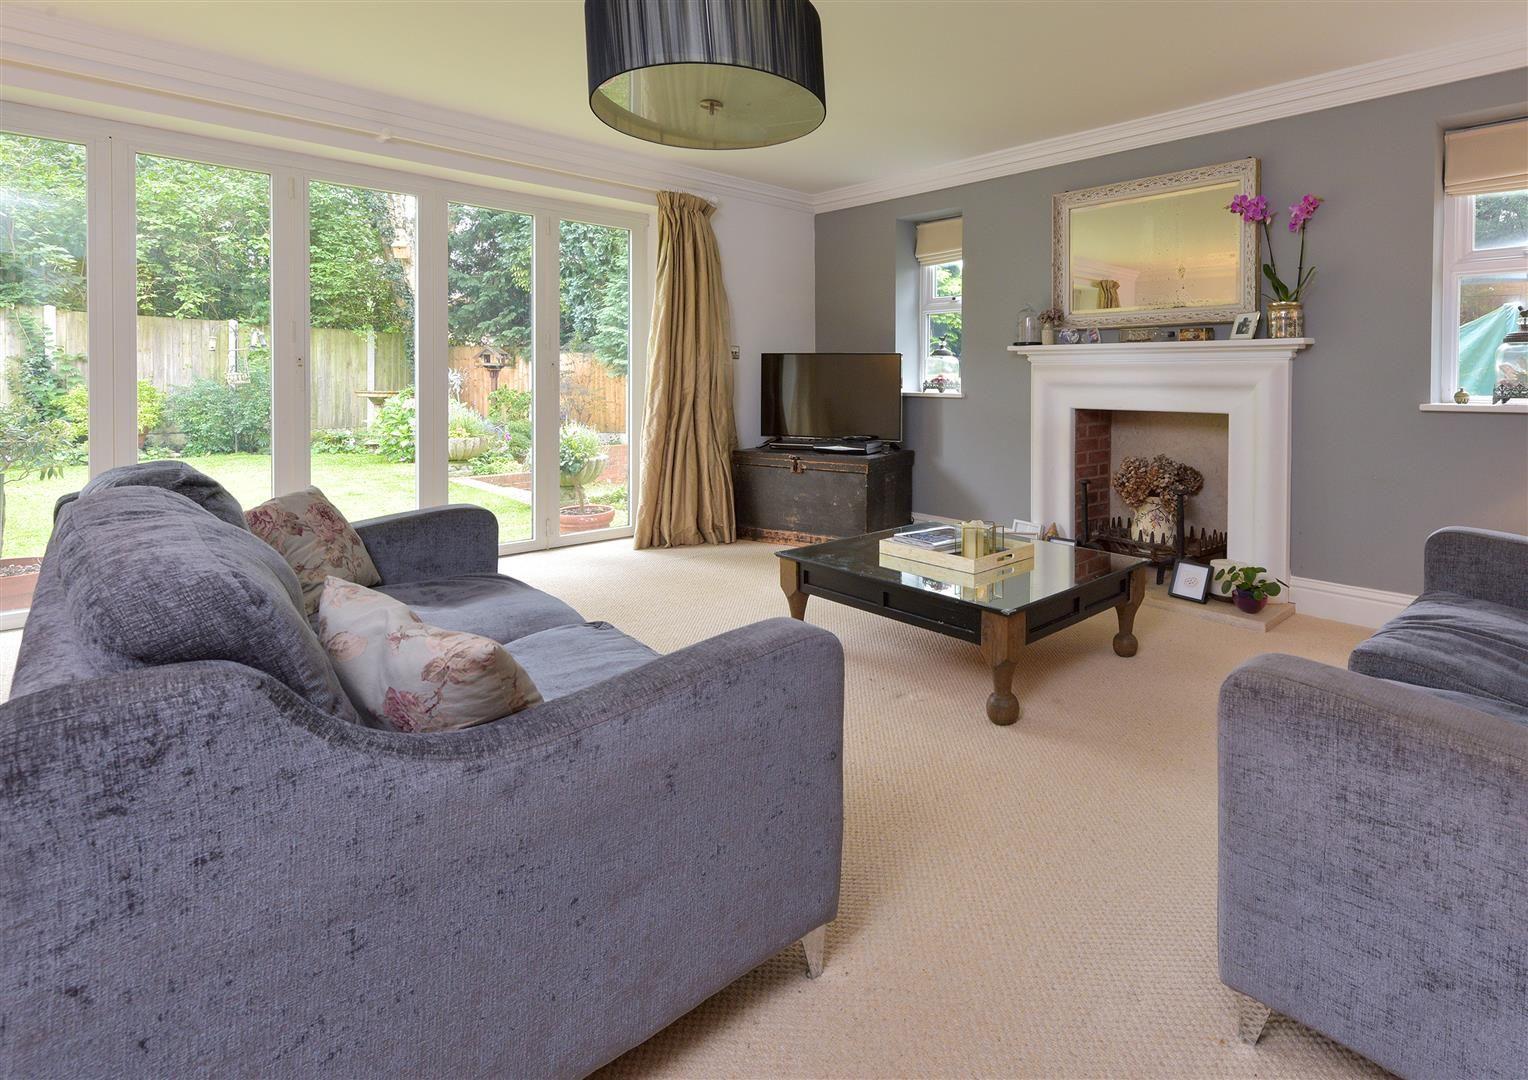 6 bed detached for sale in Kinver  - Property Image 4